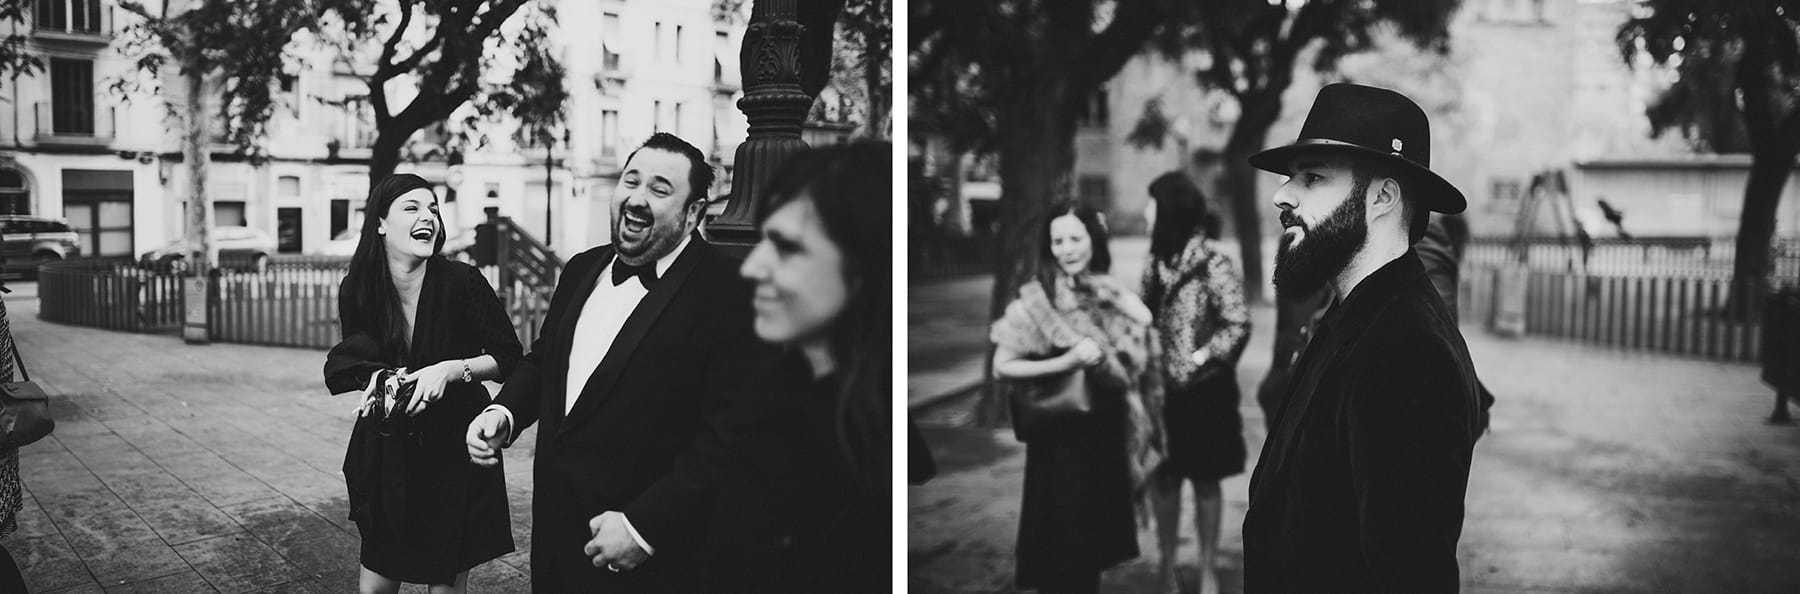 vestido_de_novia_otaduy_hilario_sanchez_fotografo_boda_barcelona_049